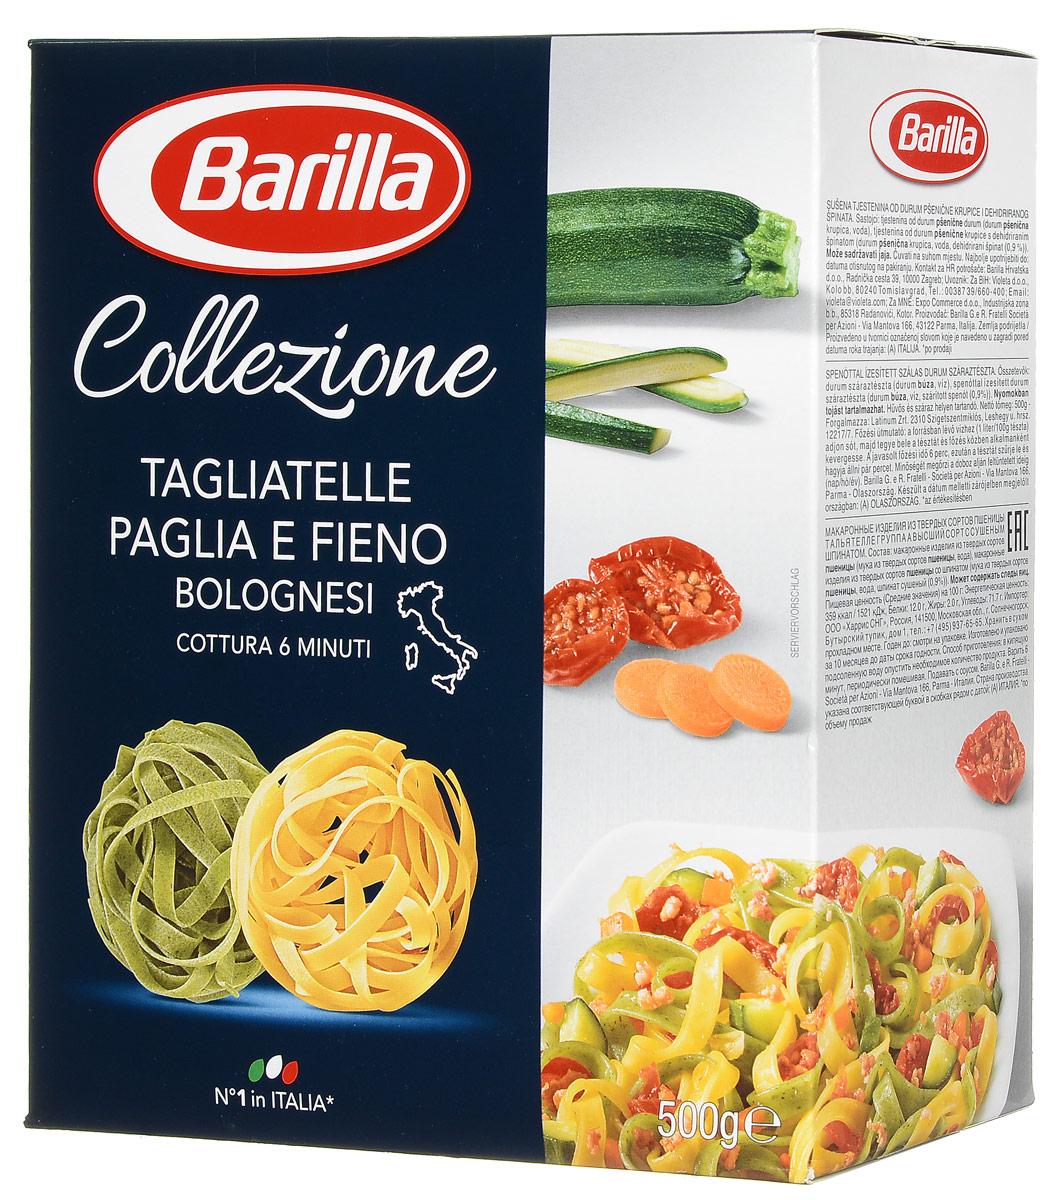 Barilla Tagliatelle Paglia e Fieno паста тальятелле палья и фьено, 500 г